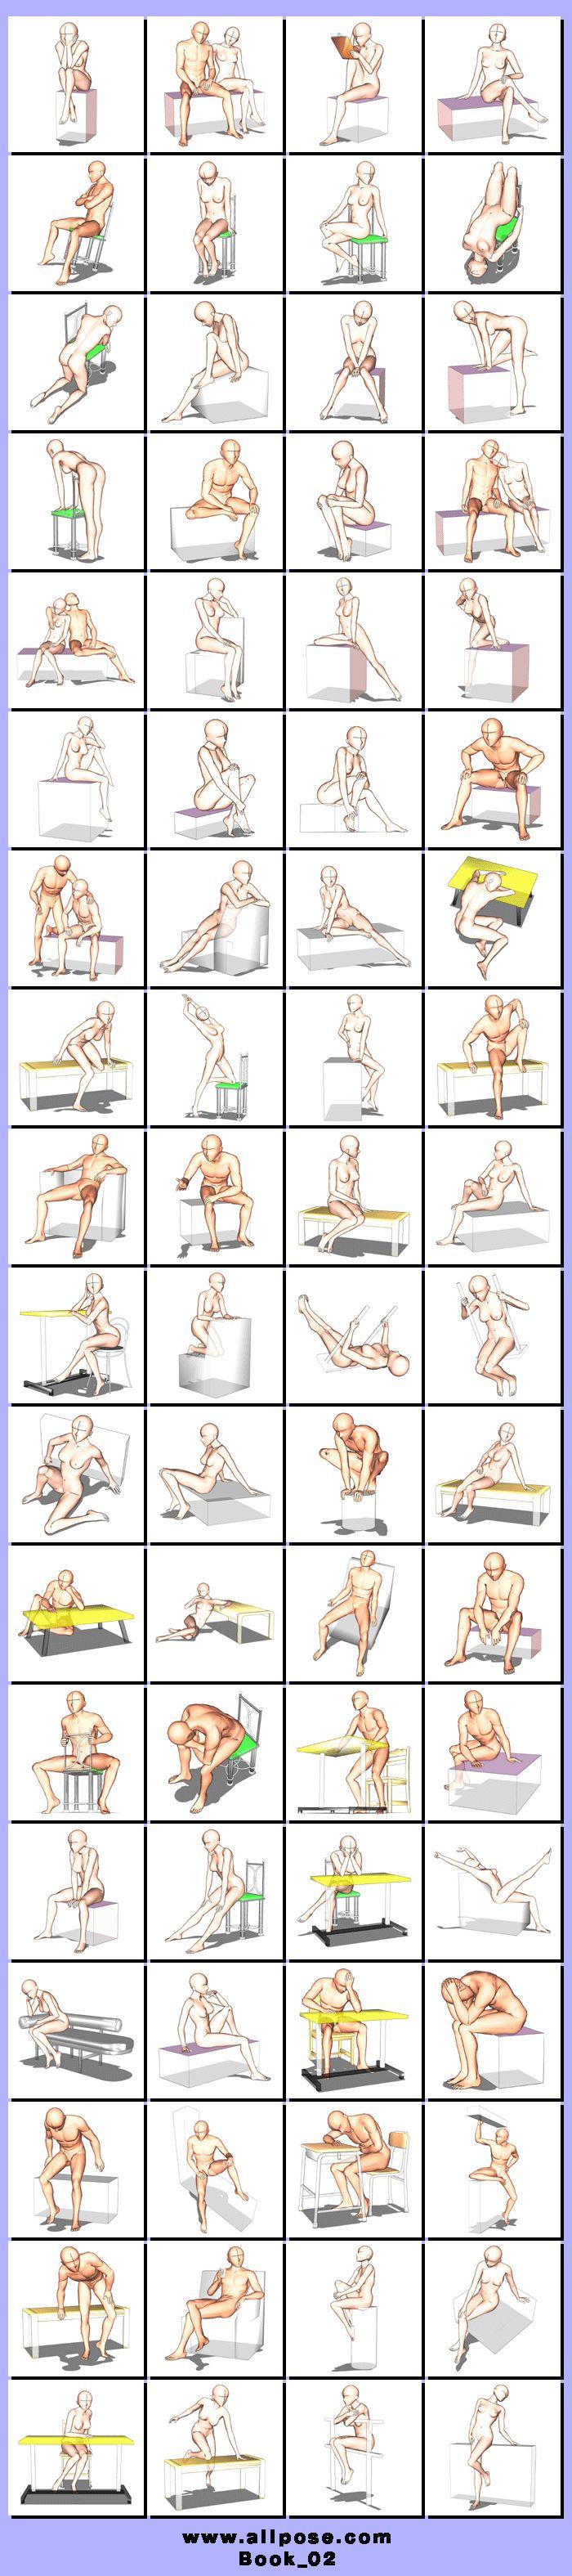 #Poses Chair http://allpose.com